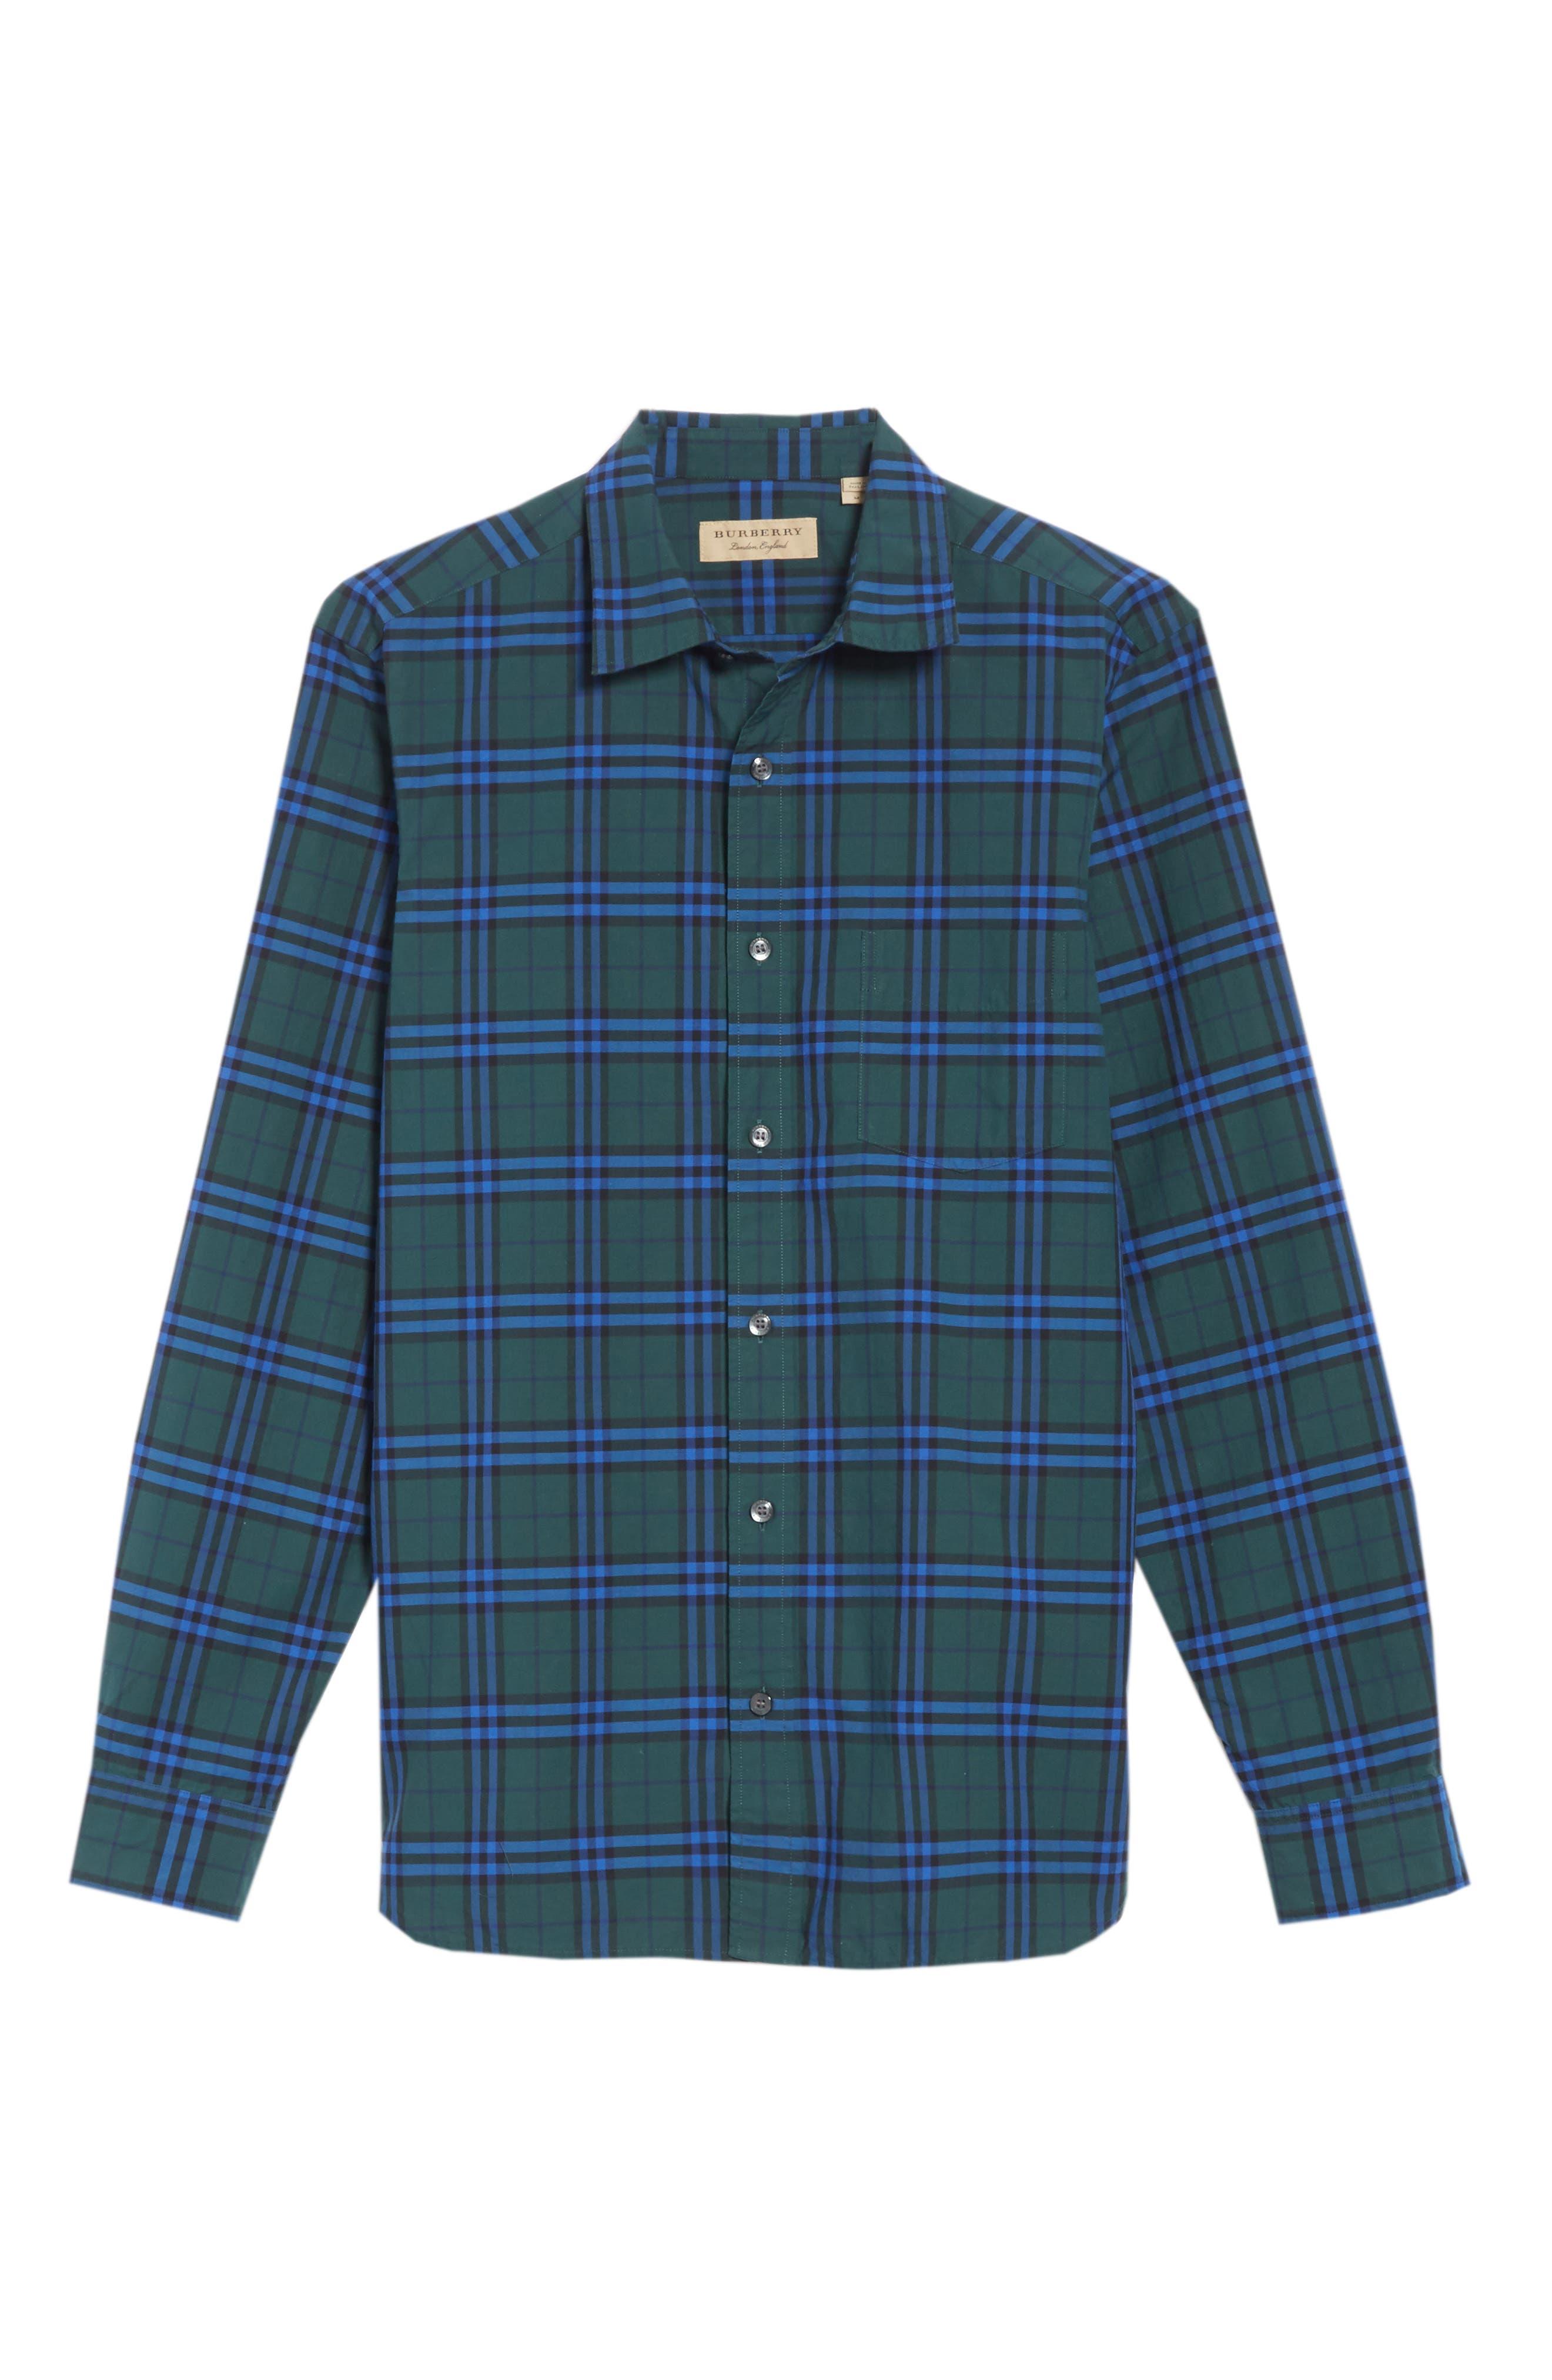 Alexander Check Sport Shirt,                             Alternate thumbnail 6, color,                             341